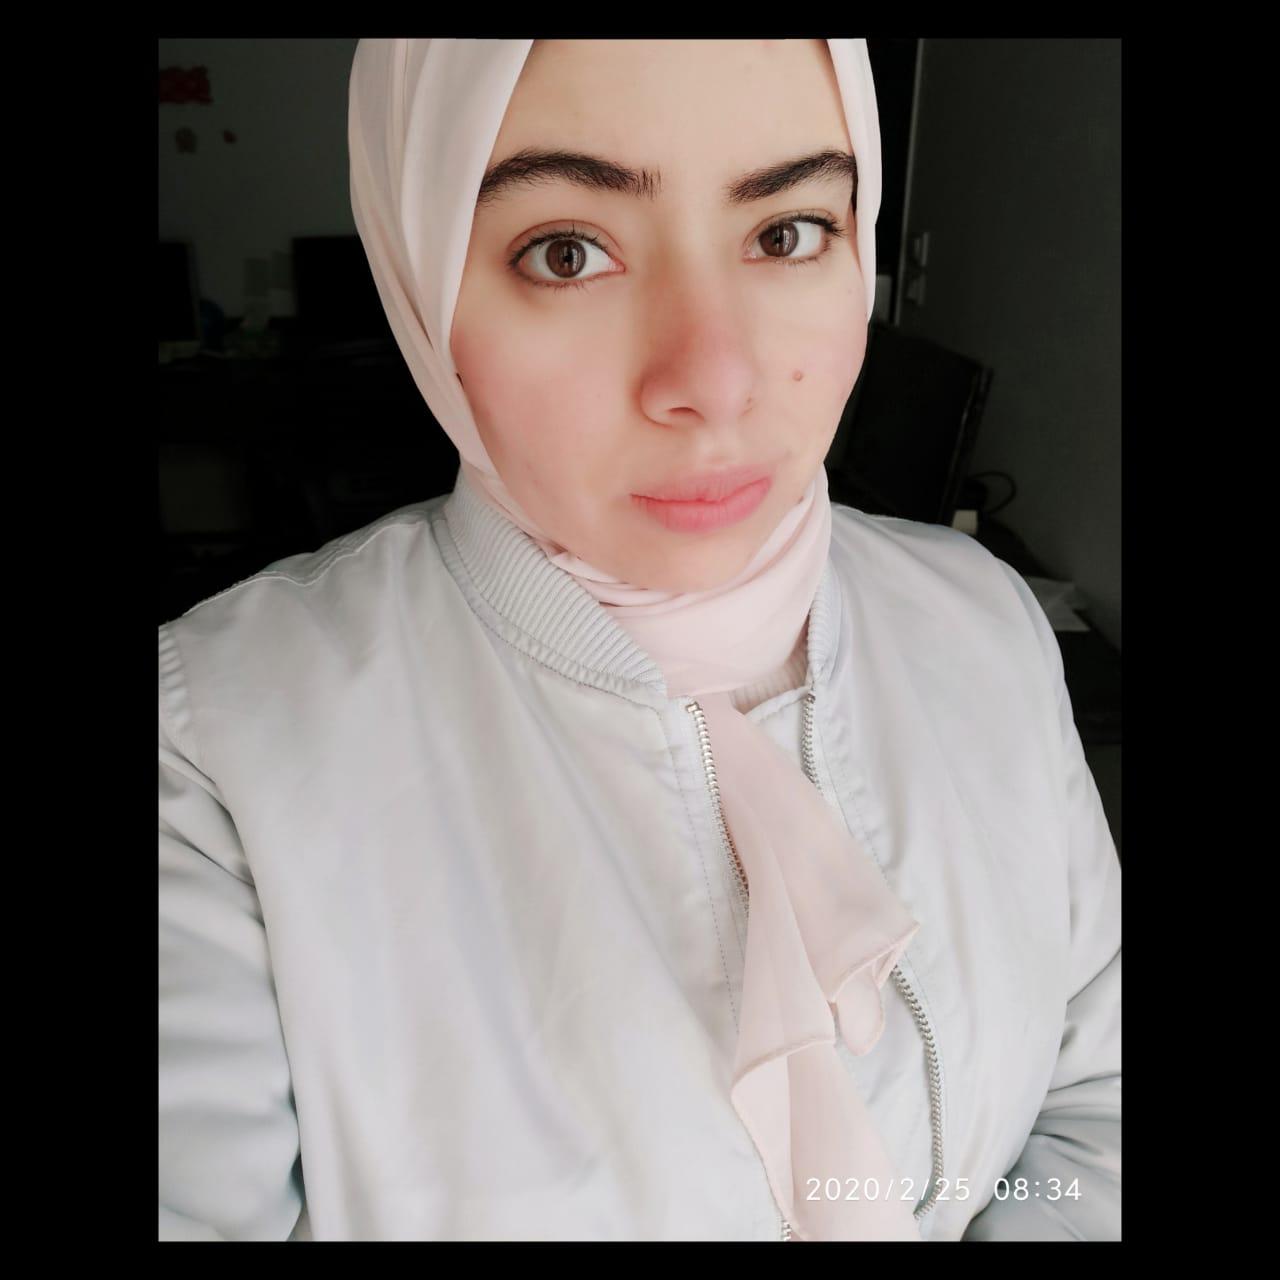 Eman Elhelaly